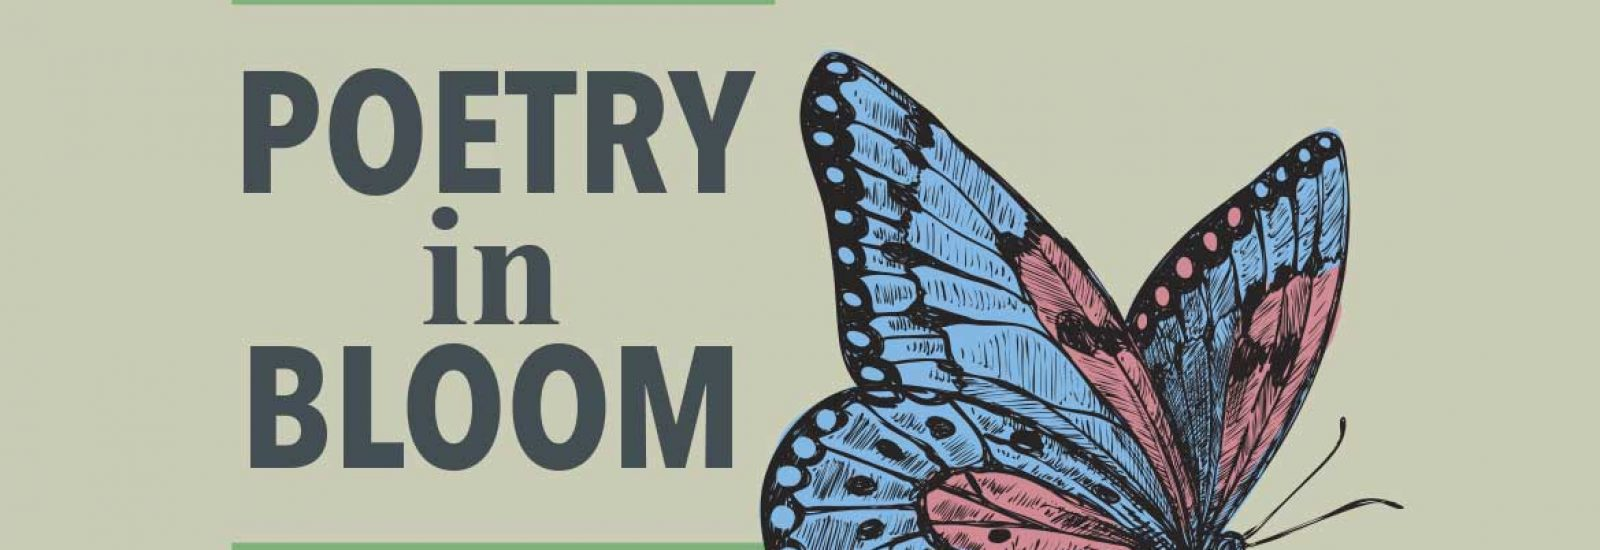 Poetry in Bloom at Powerscourt Estate